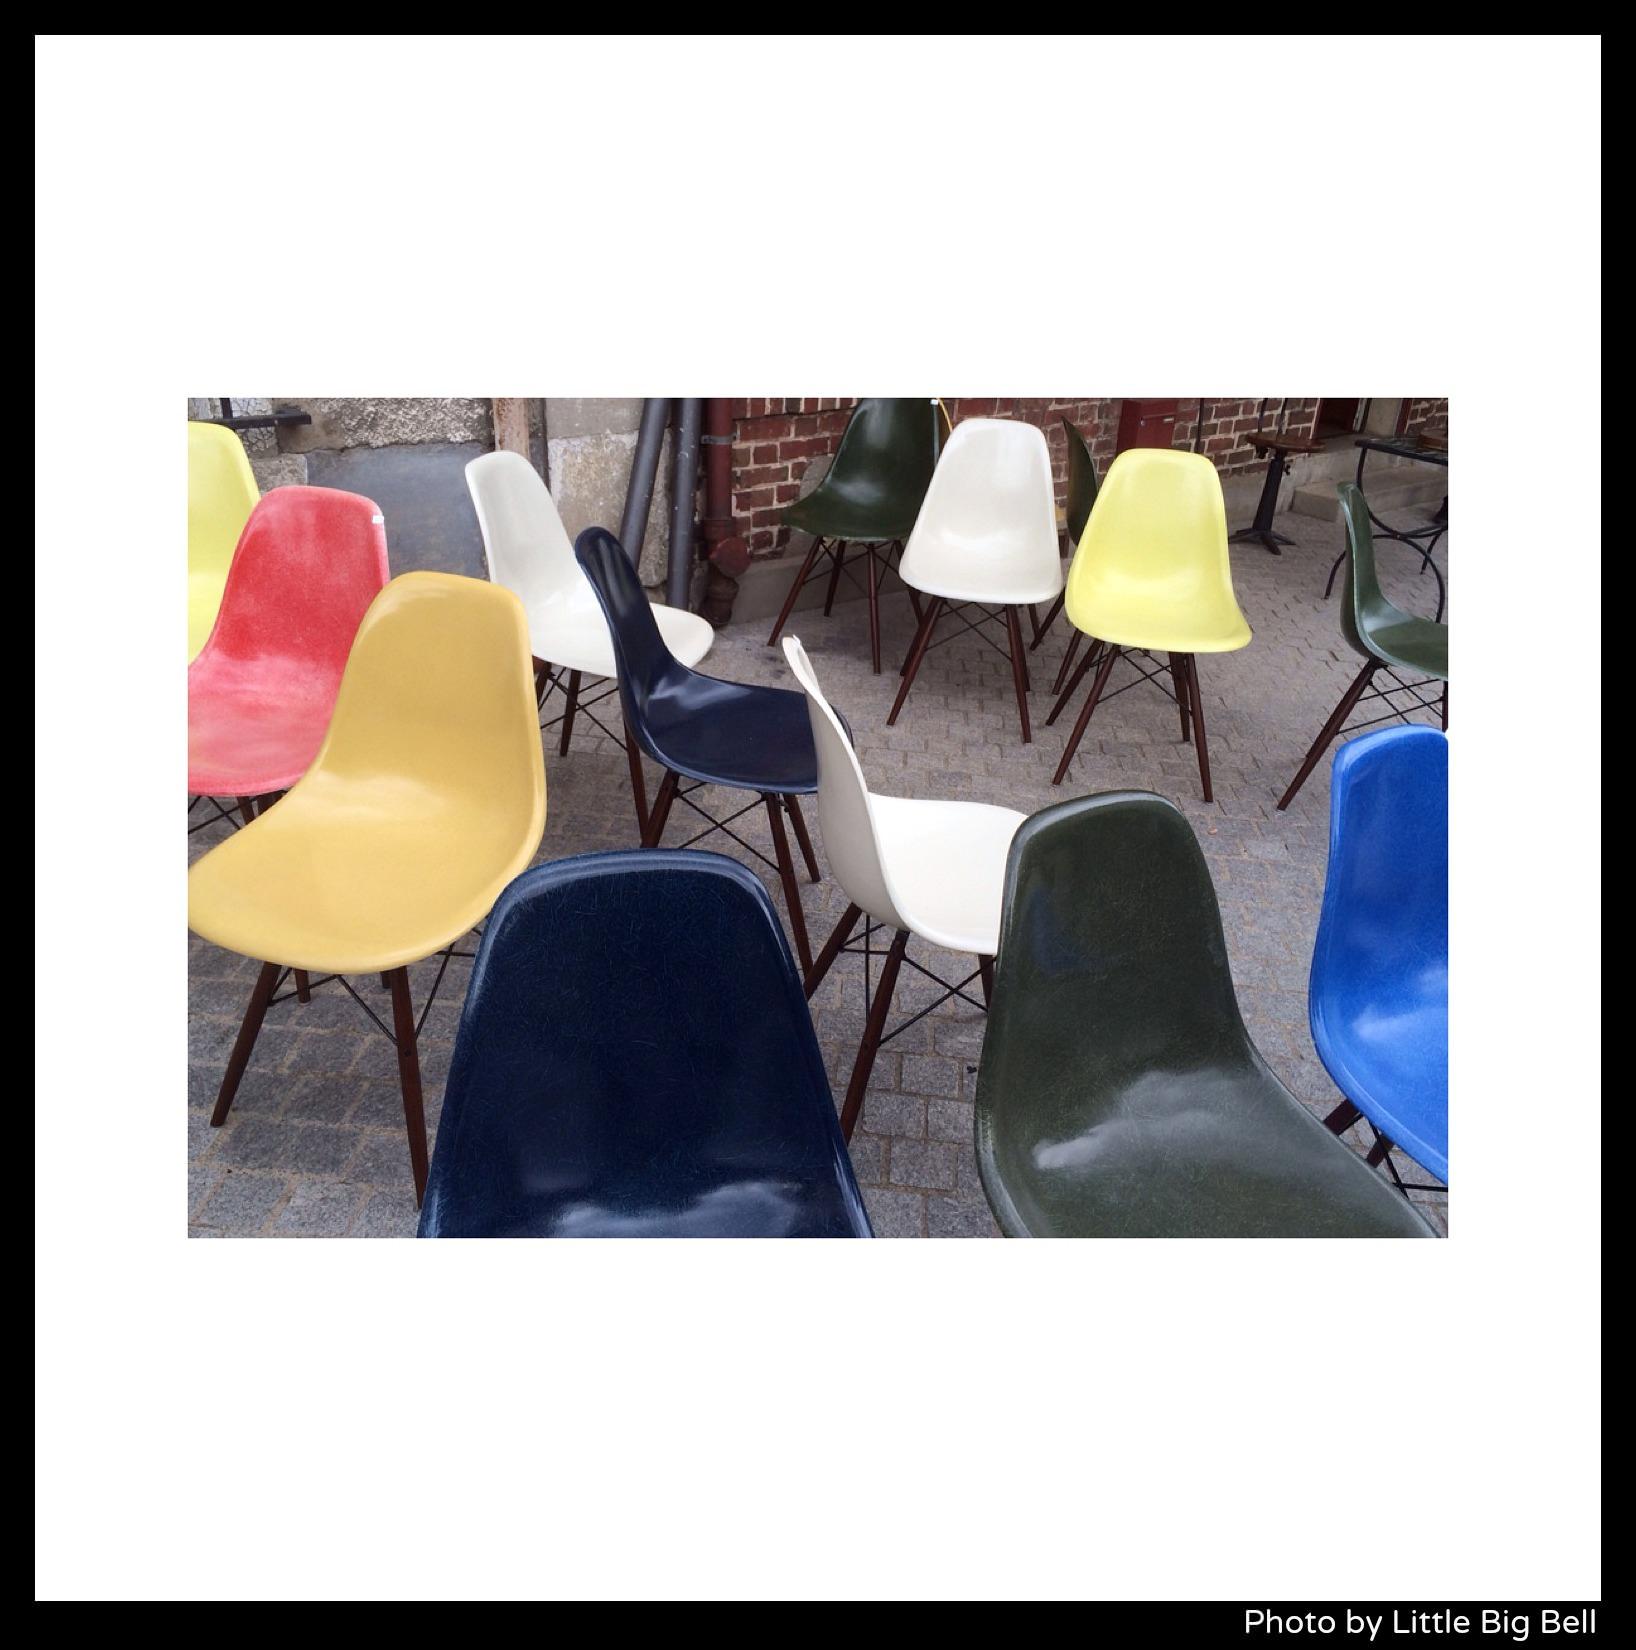 Vintage-Eames-chairs-Saint-Ouen-Paris-photos-by-Little-Big-Bell.jpg